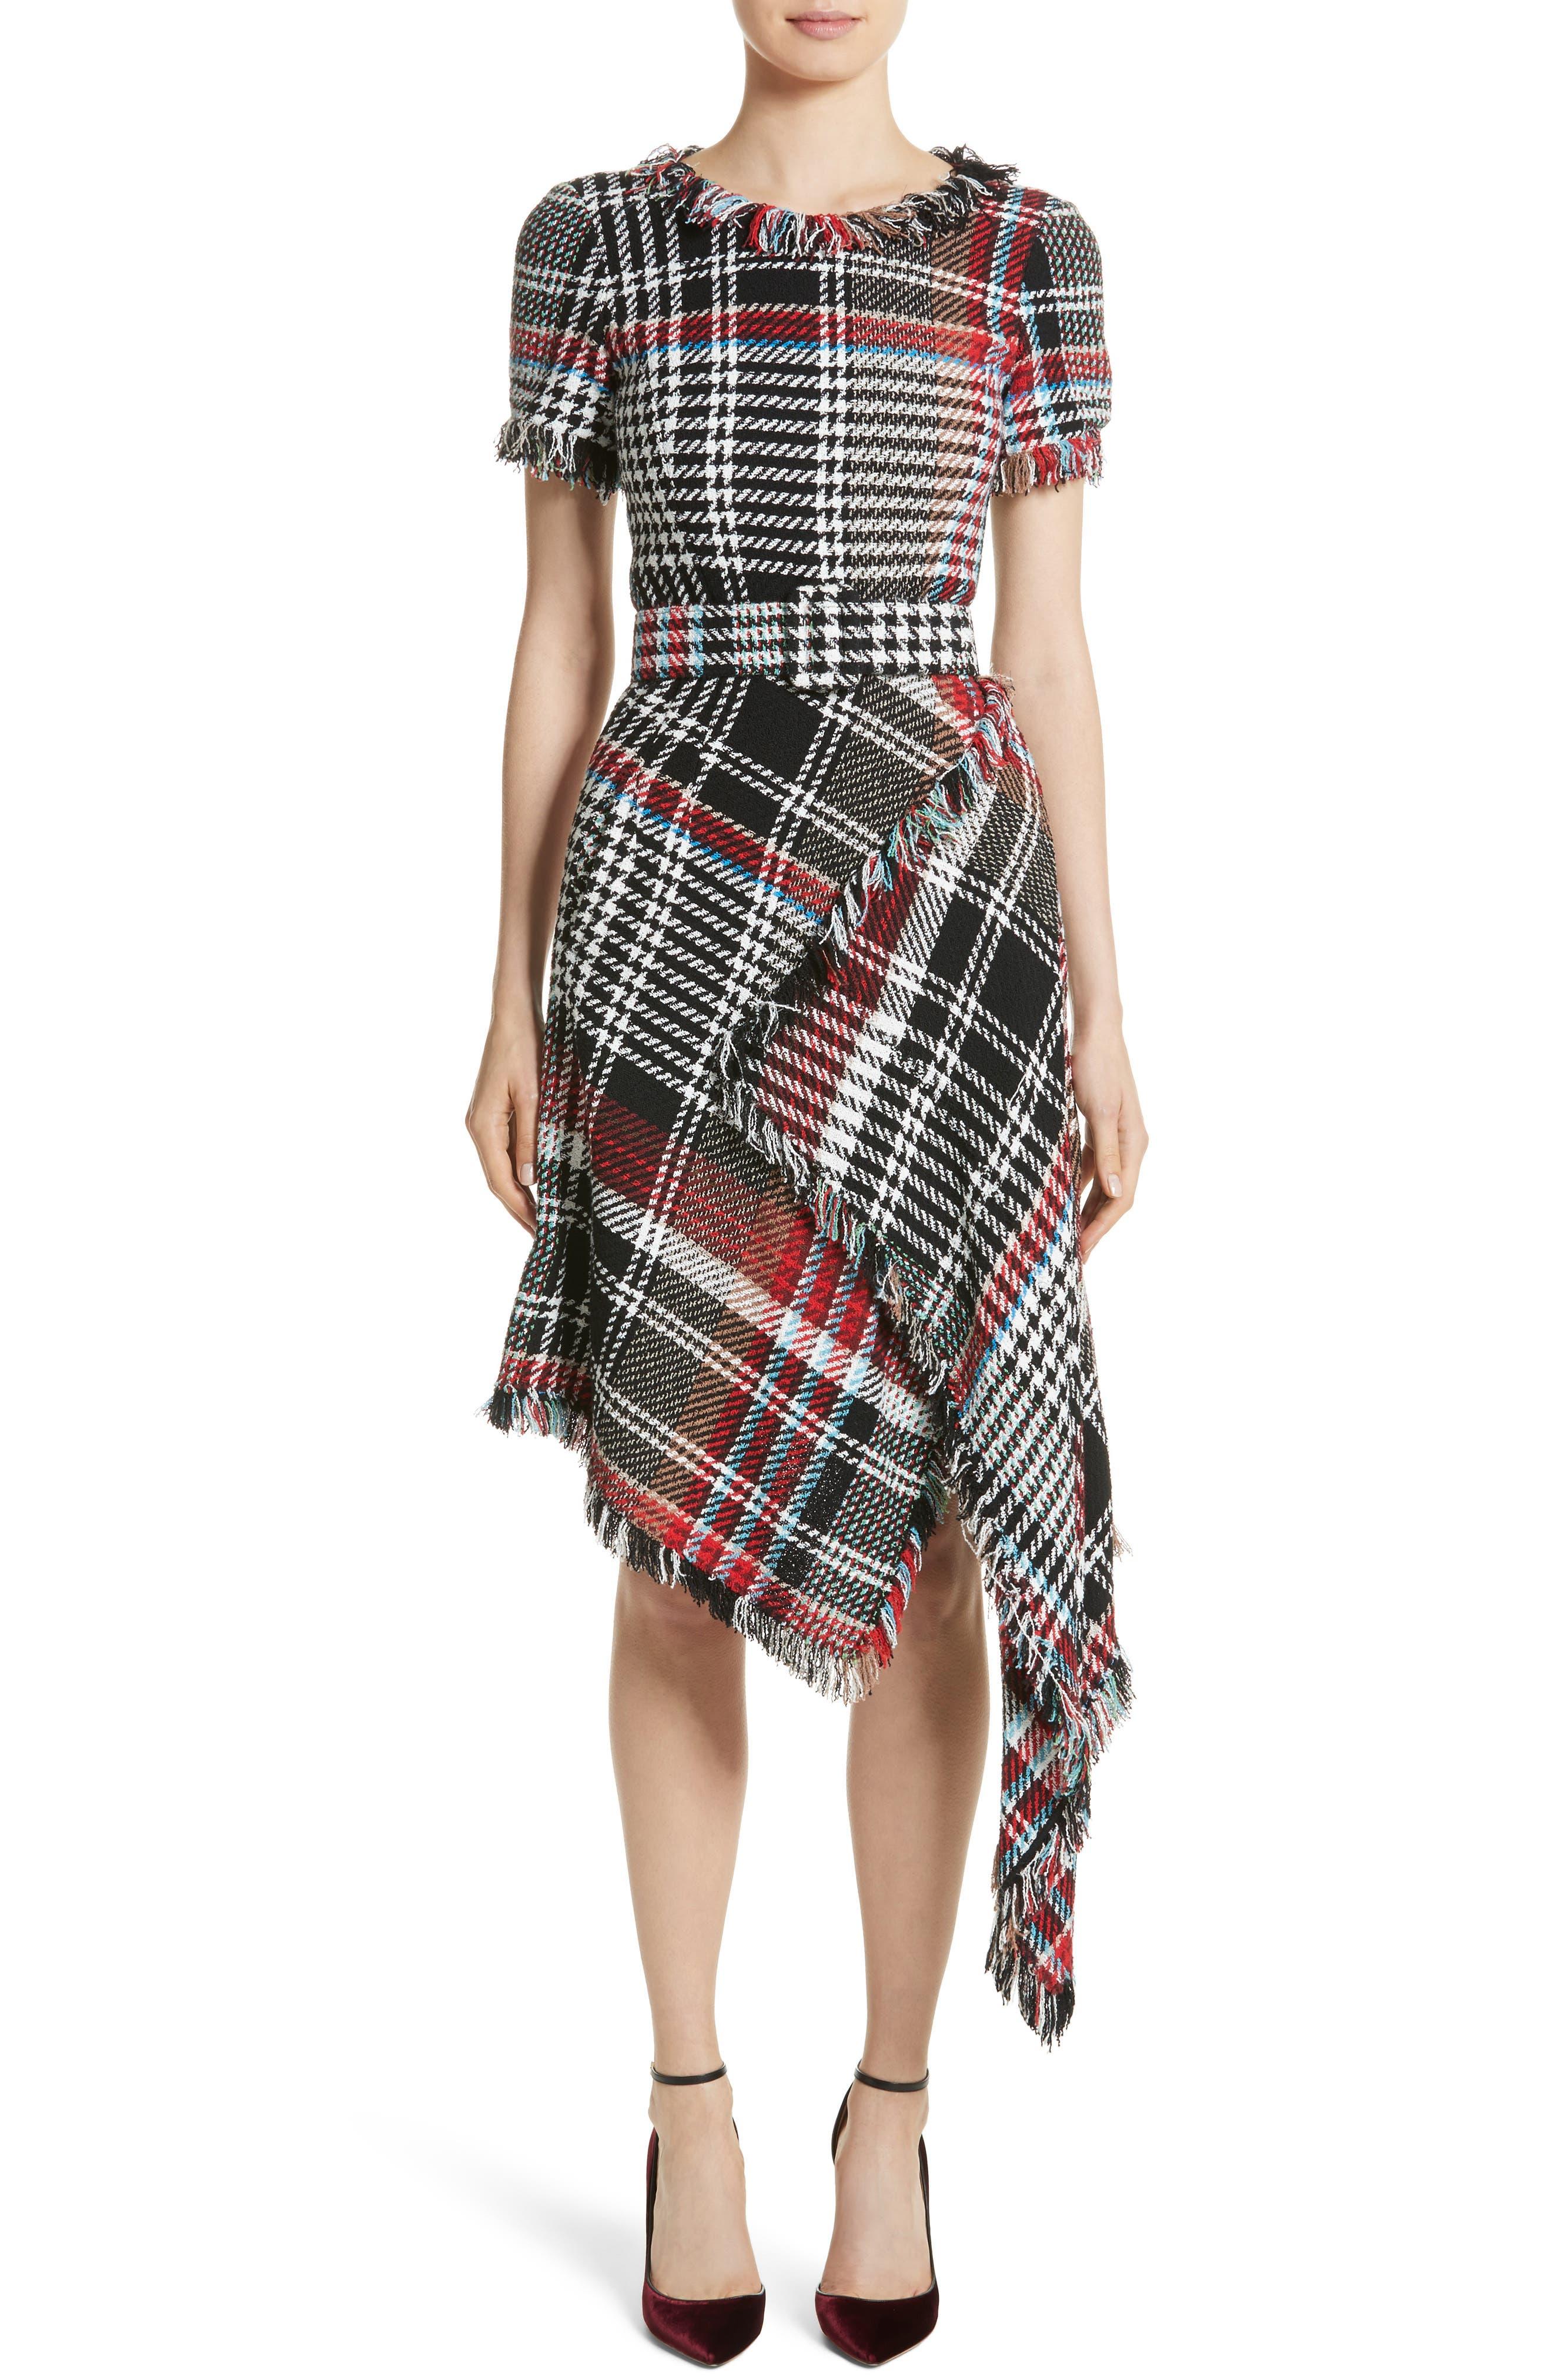 Alternate Image 1 Selected - Oscar de la Renta Plaid Asymmetrical Dress